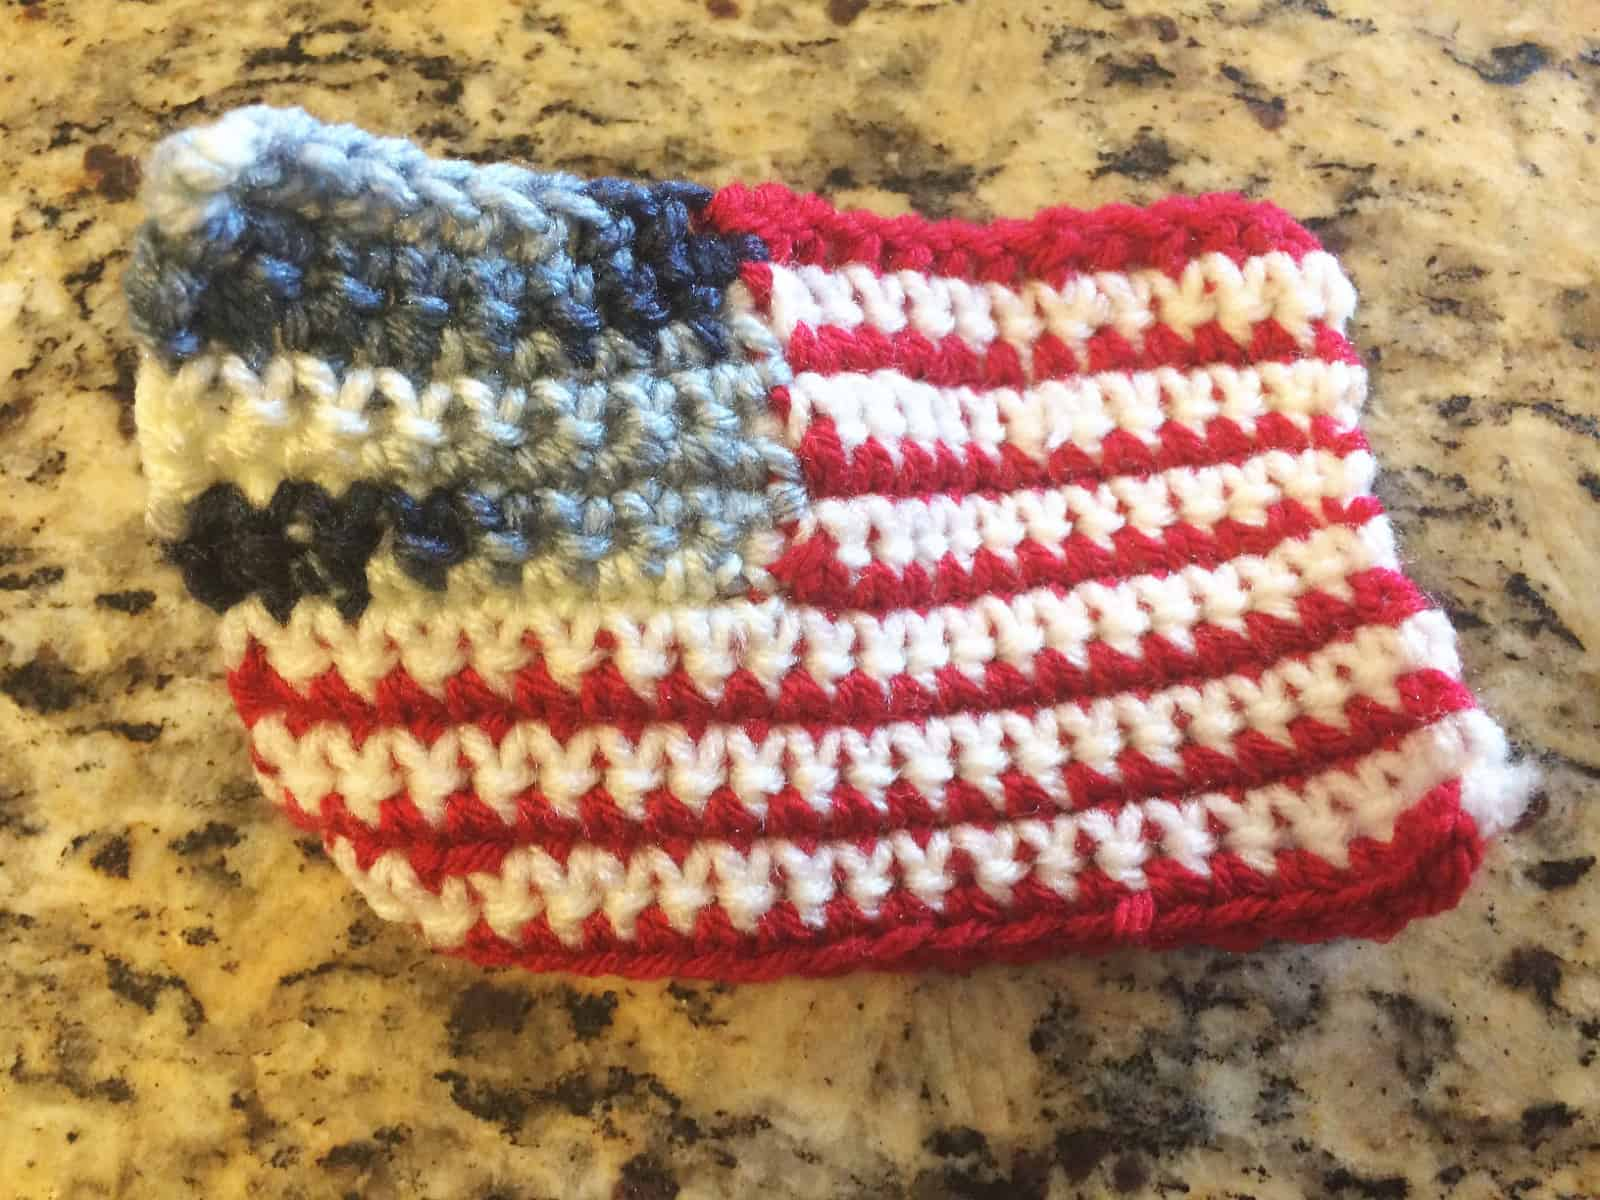 Finished crochet flag curled edges.